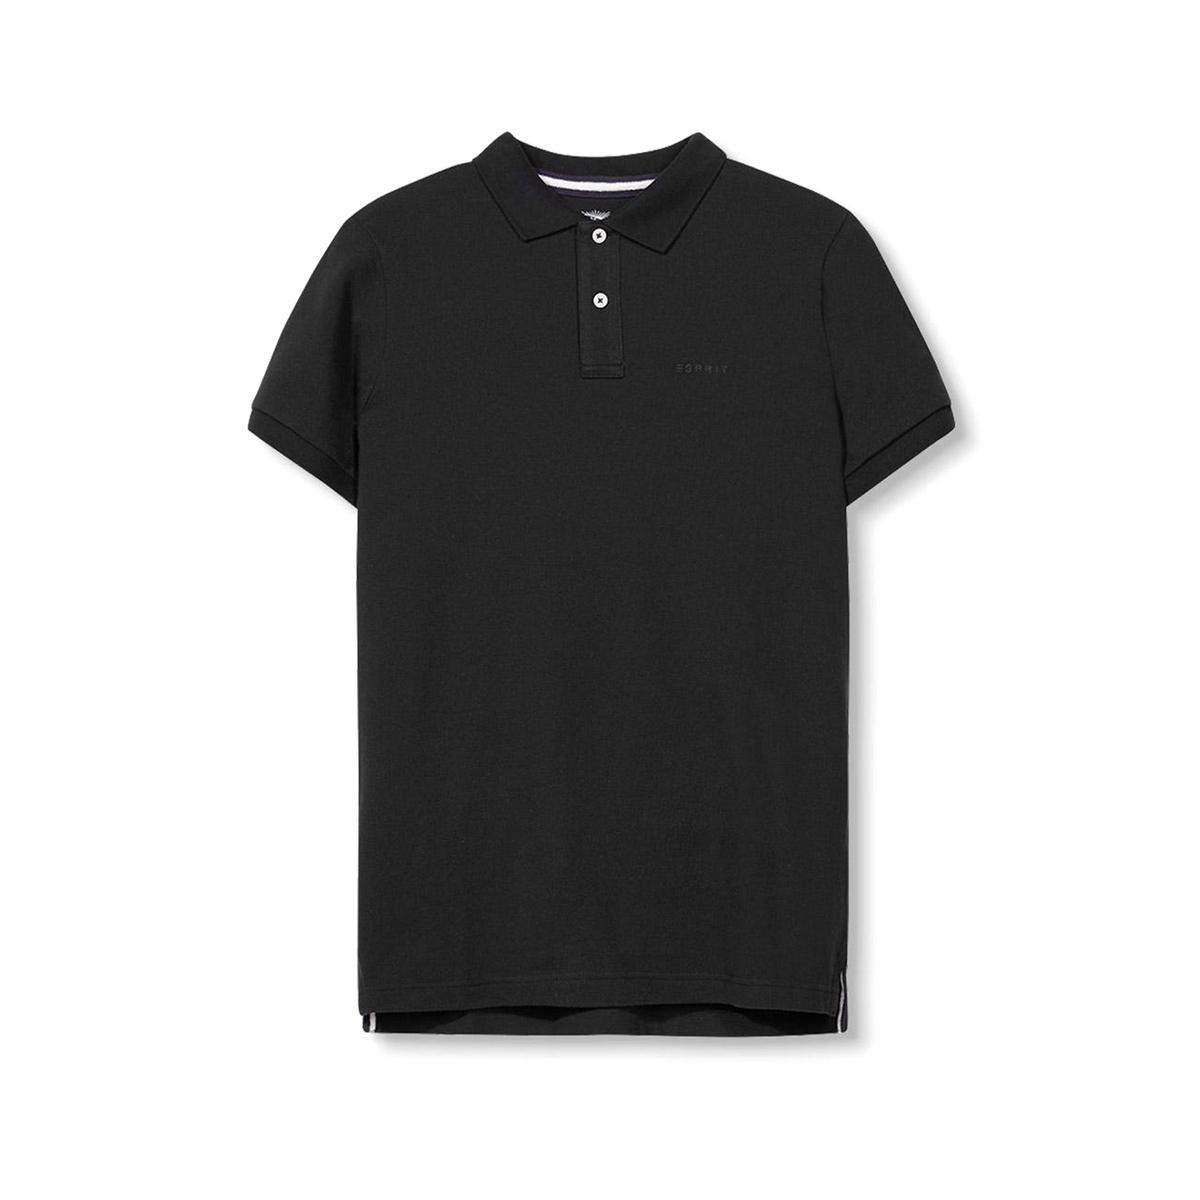 Футболка-поло с короткими рукавами футболка esprit esprit es393egrhk82